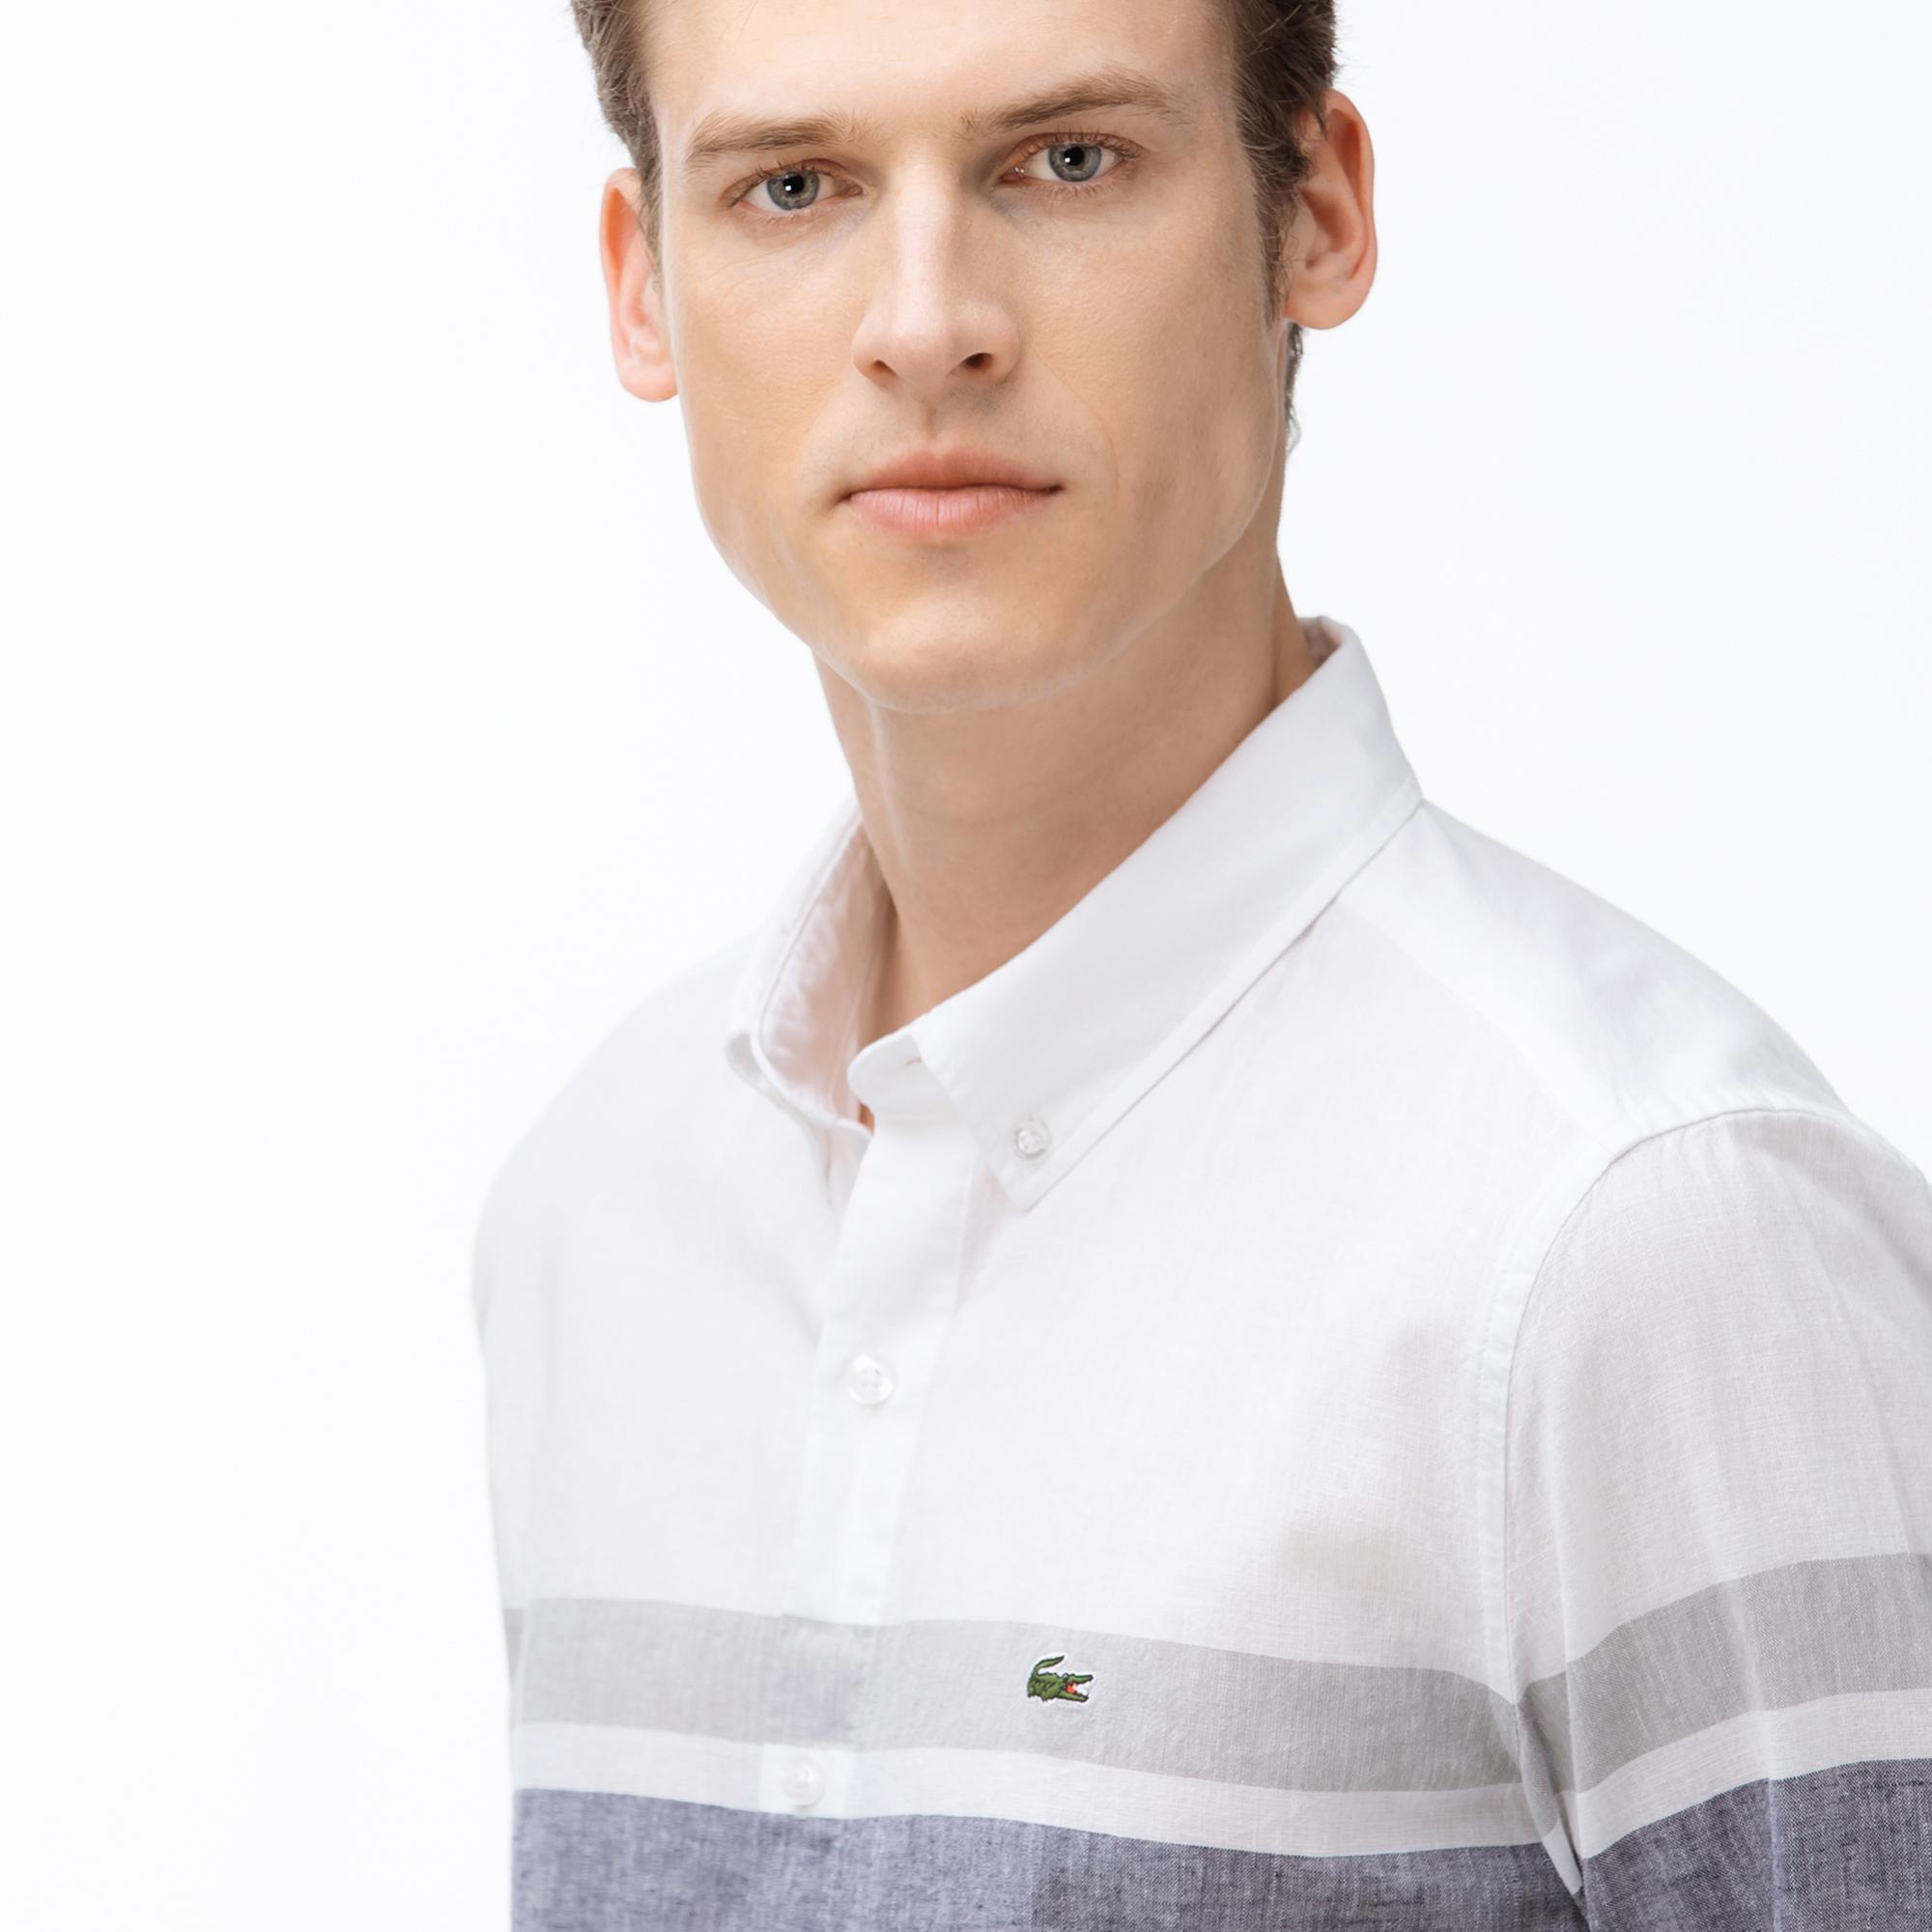 Lacoste Men's Slim Fit Block Striped Button-Down Collar Shirt